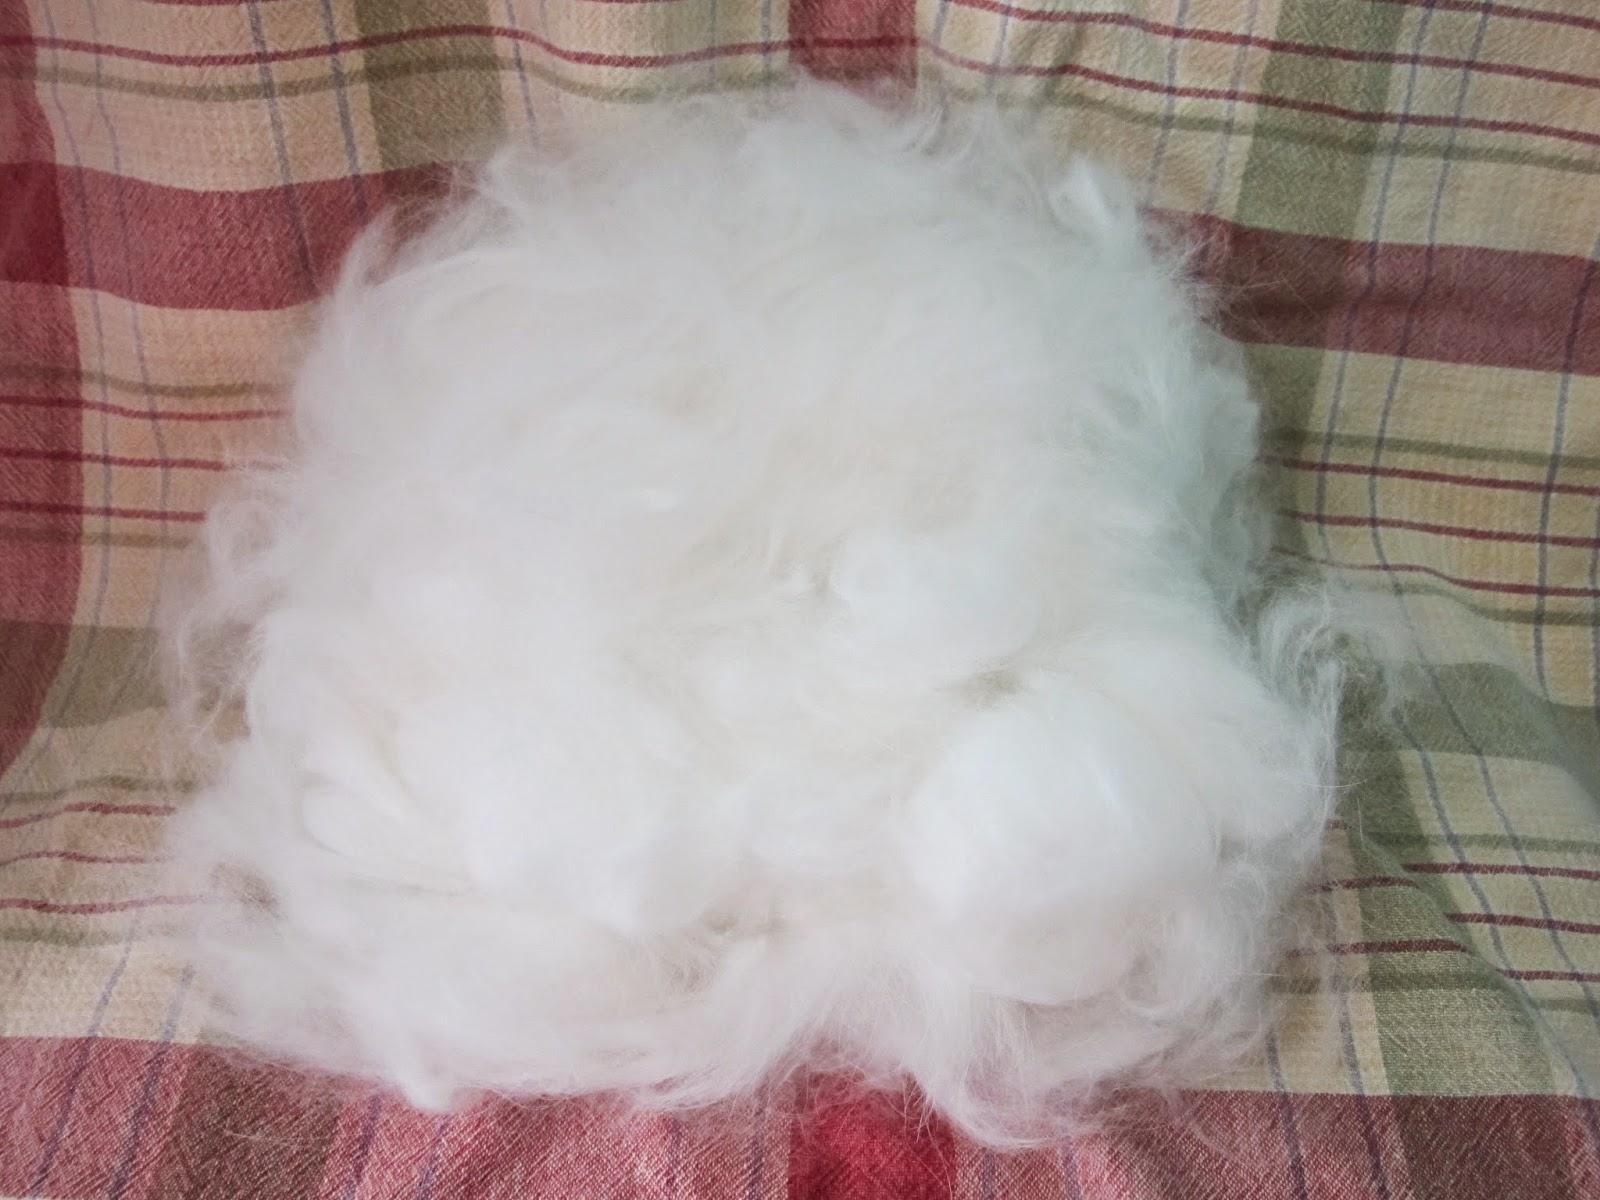 https://www.etsy.com/listing/196423219/cloud-soft-purebred-french-angora-fiber?ref=shop_home_active_1